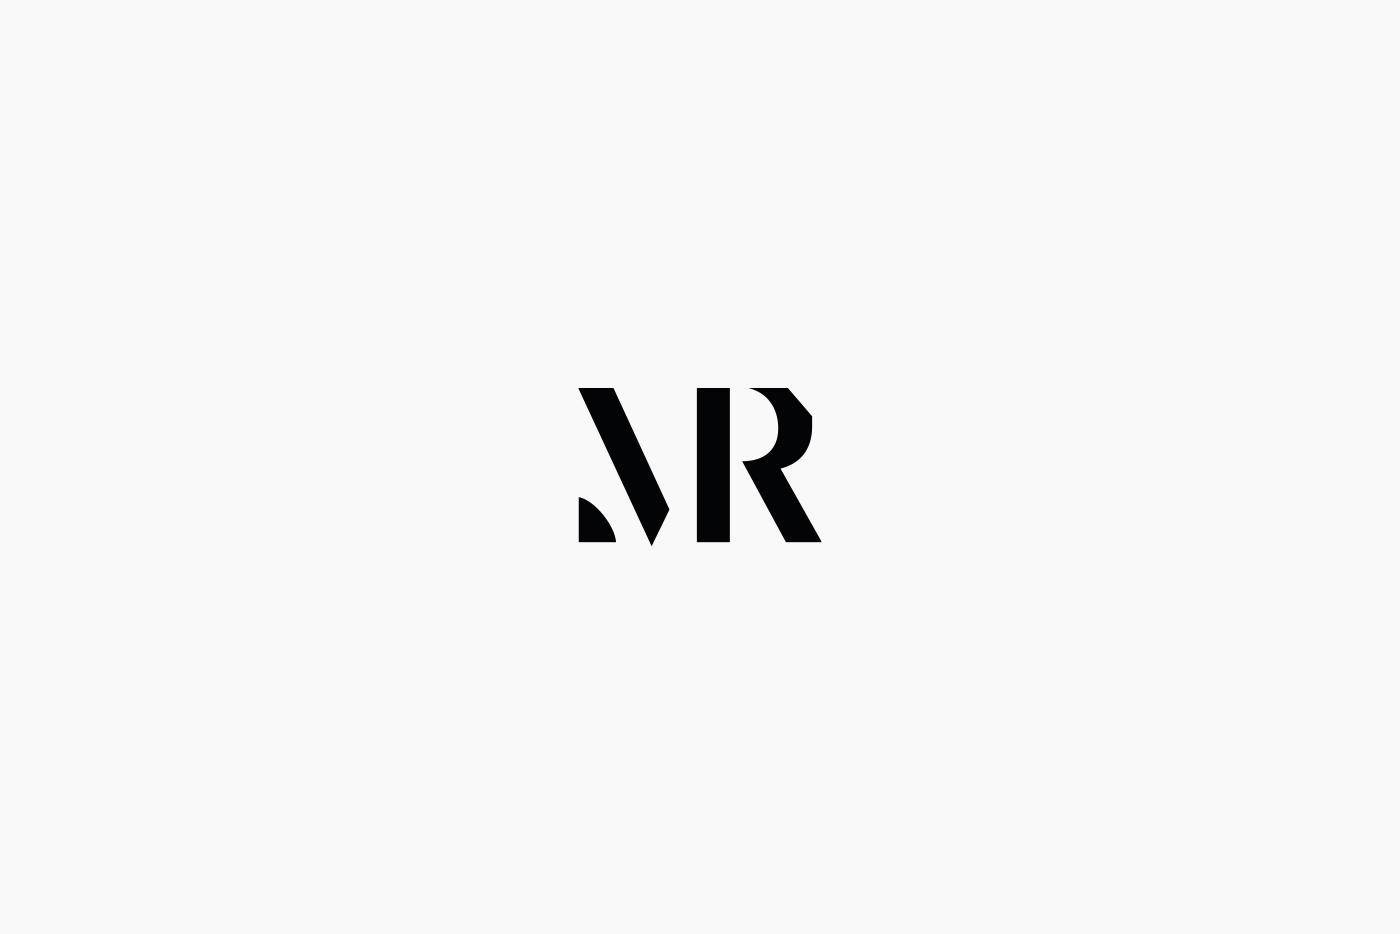 Manuel Rampin Small Logo